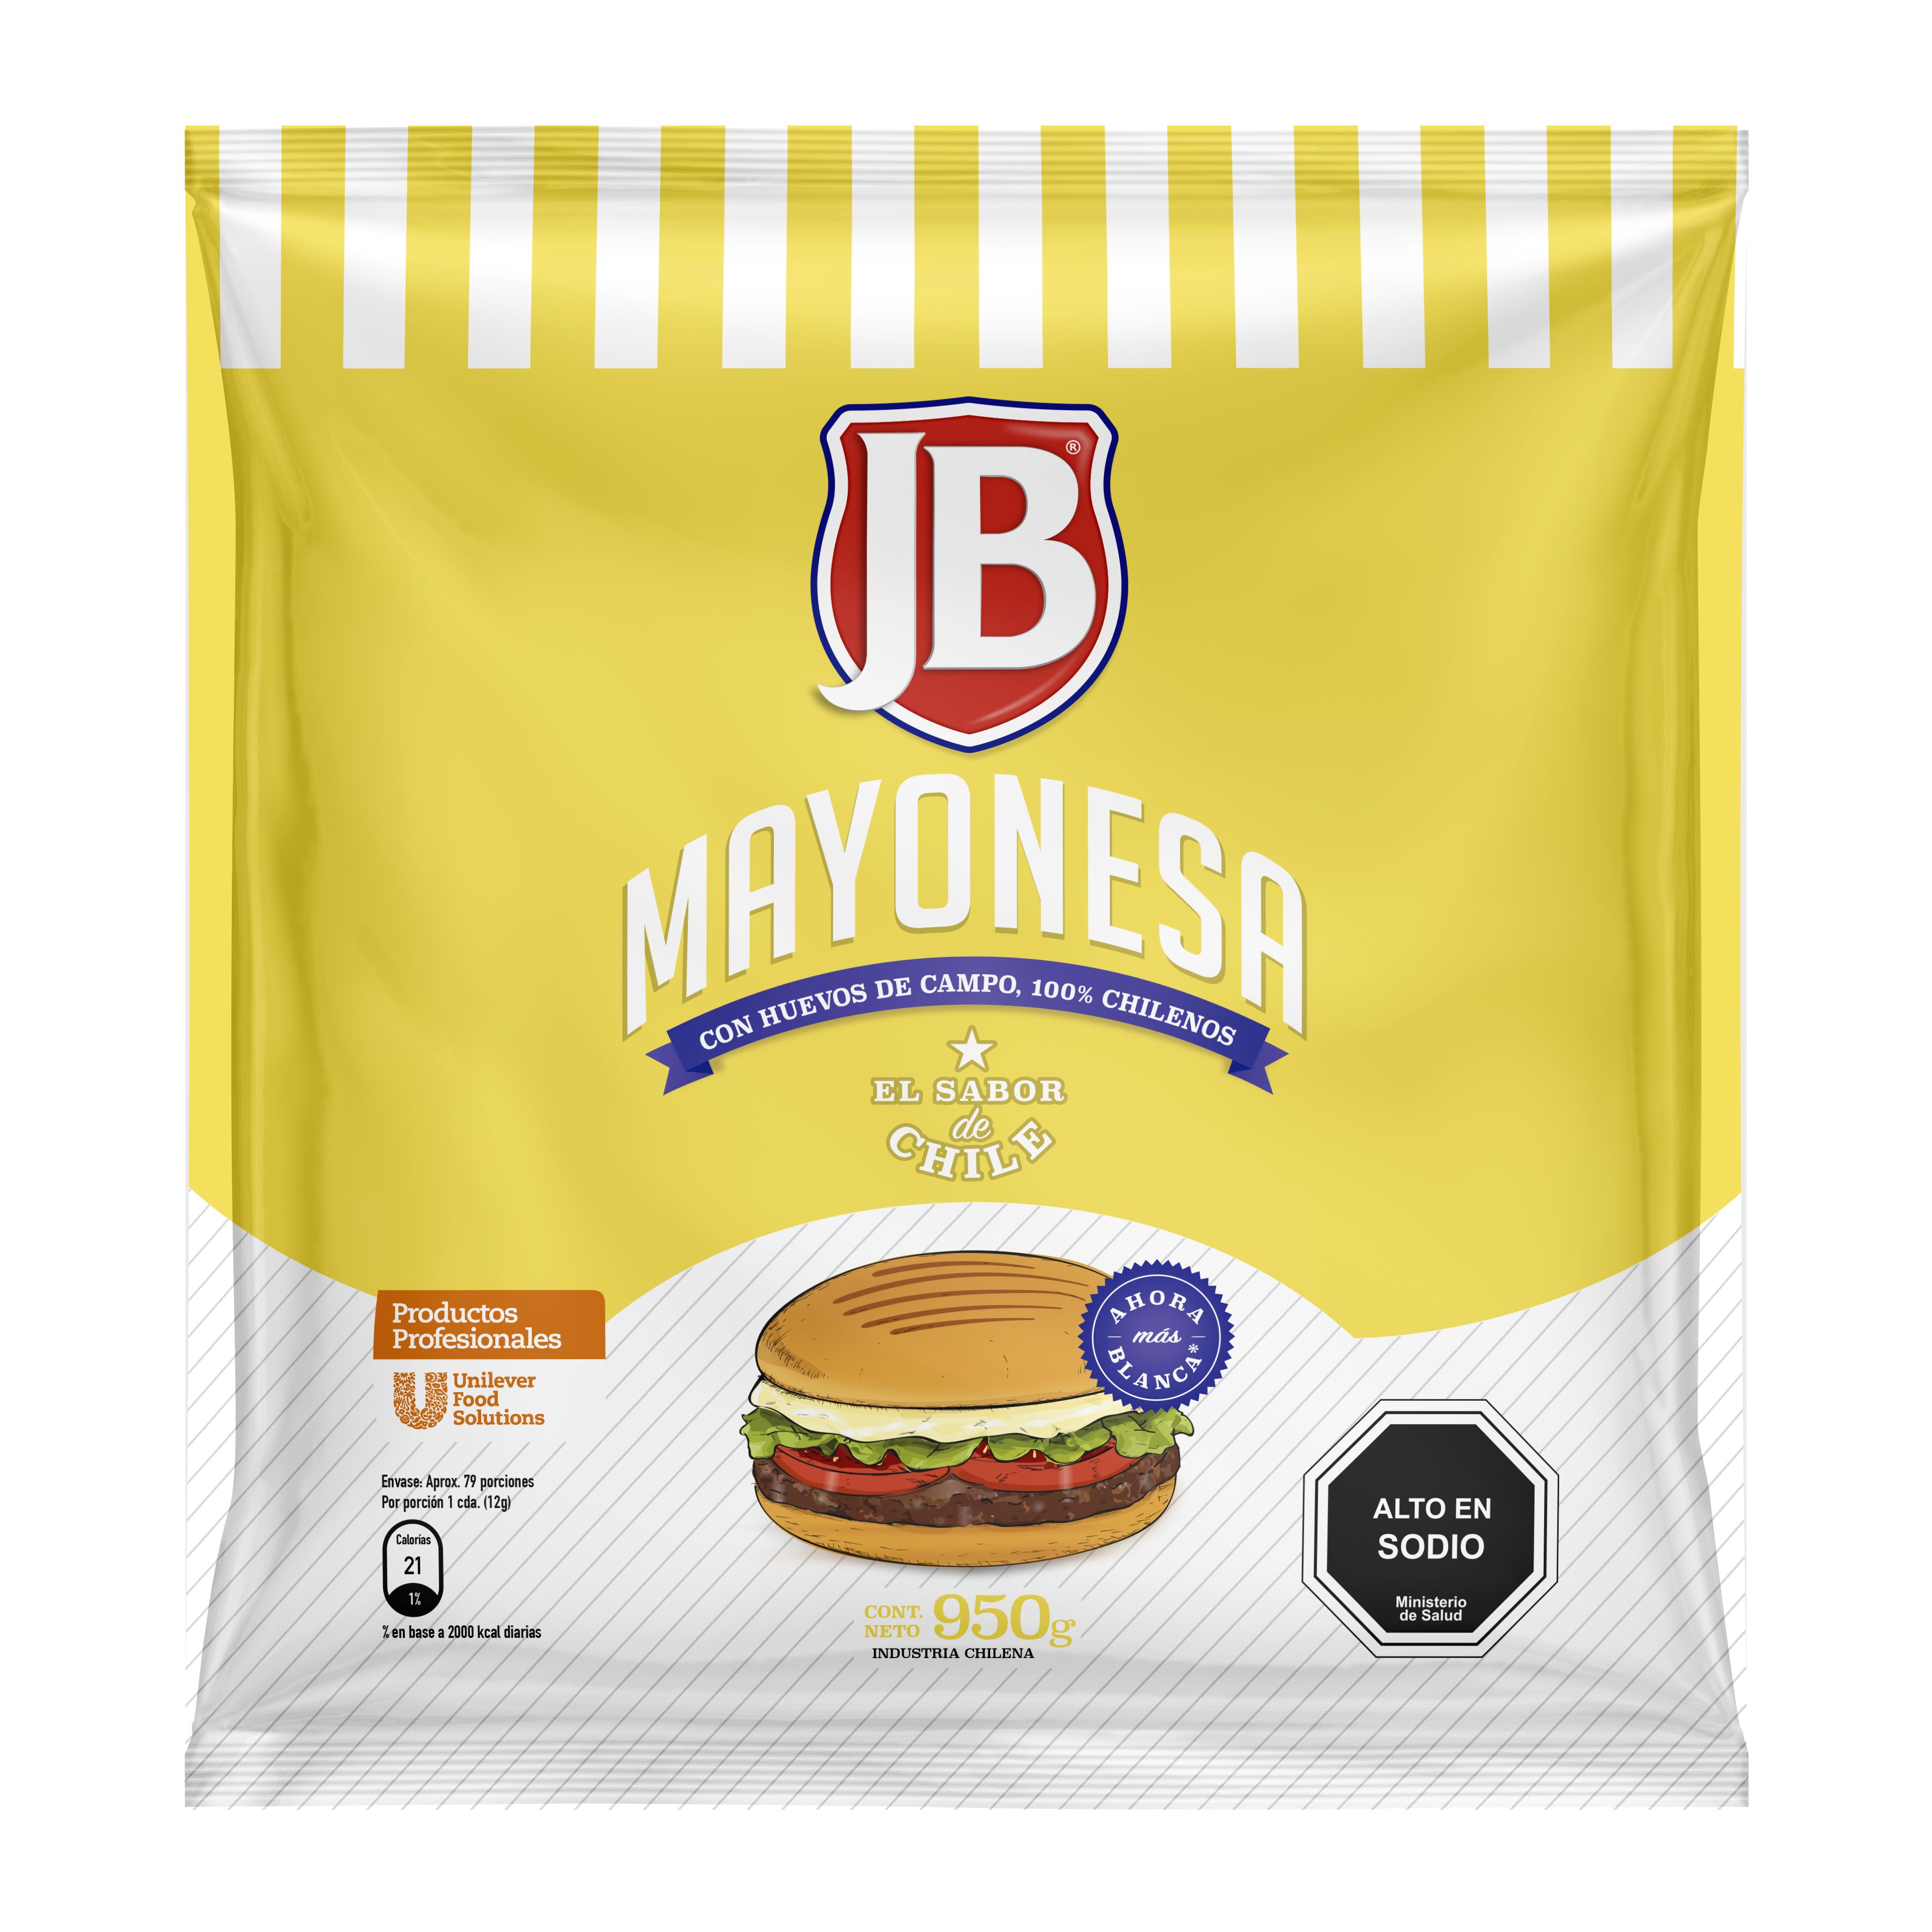 Mayonesa JB 950G